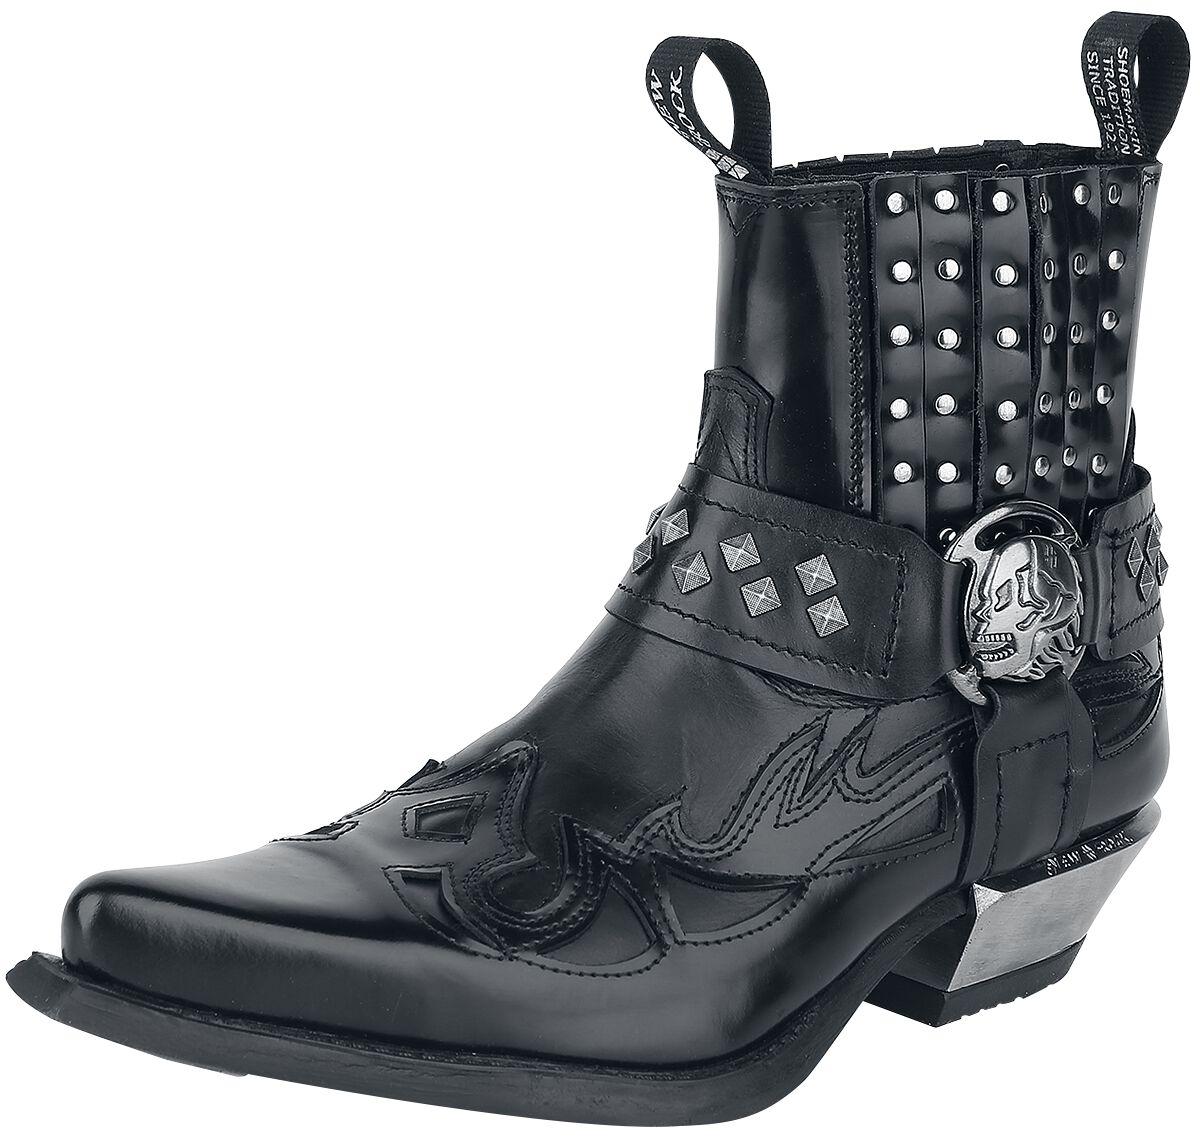 New Rock Antik Boot schwarz M.7950-C1 ANTIK NEGRO, ITALI NEGRO, WEST  NEGRO-A